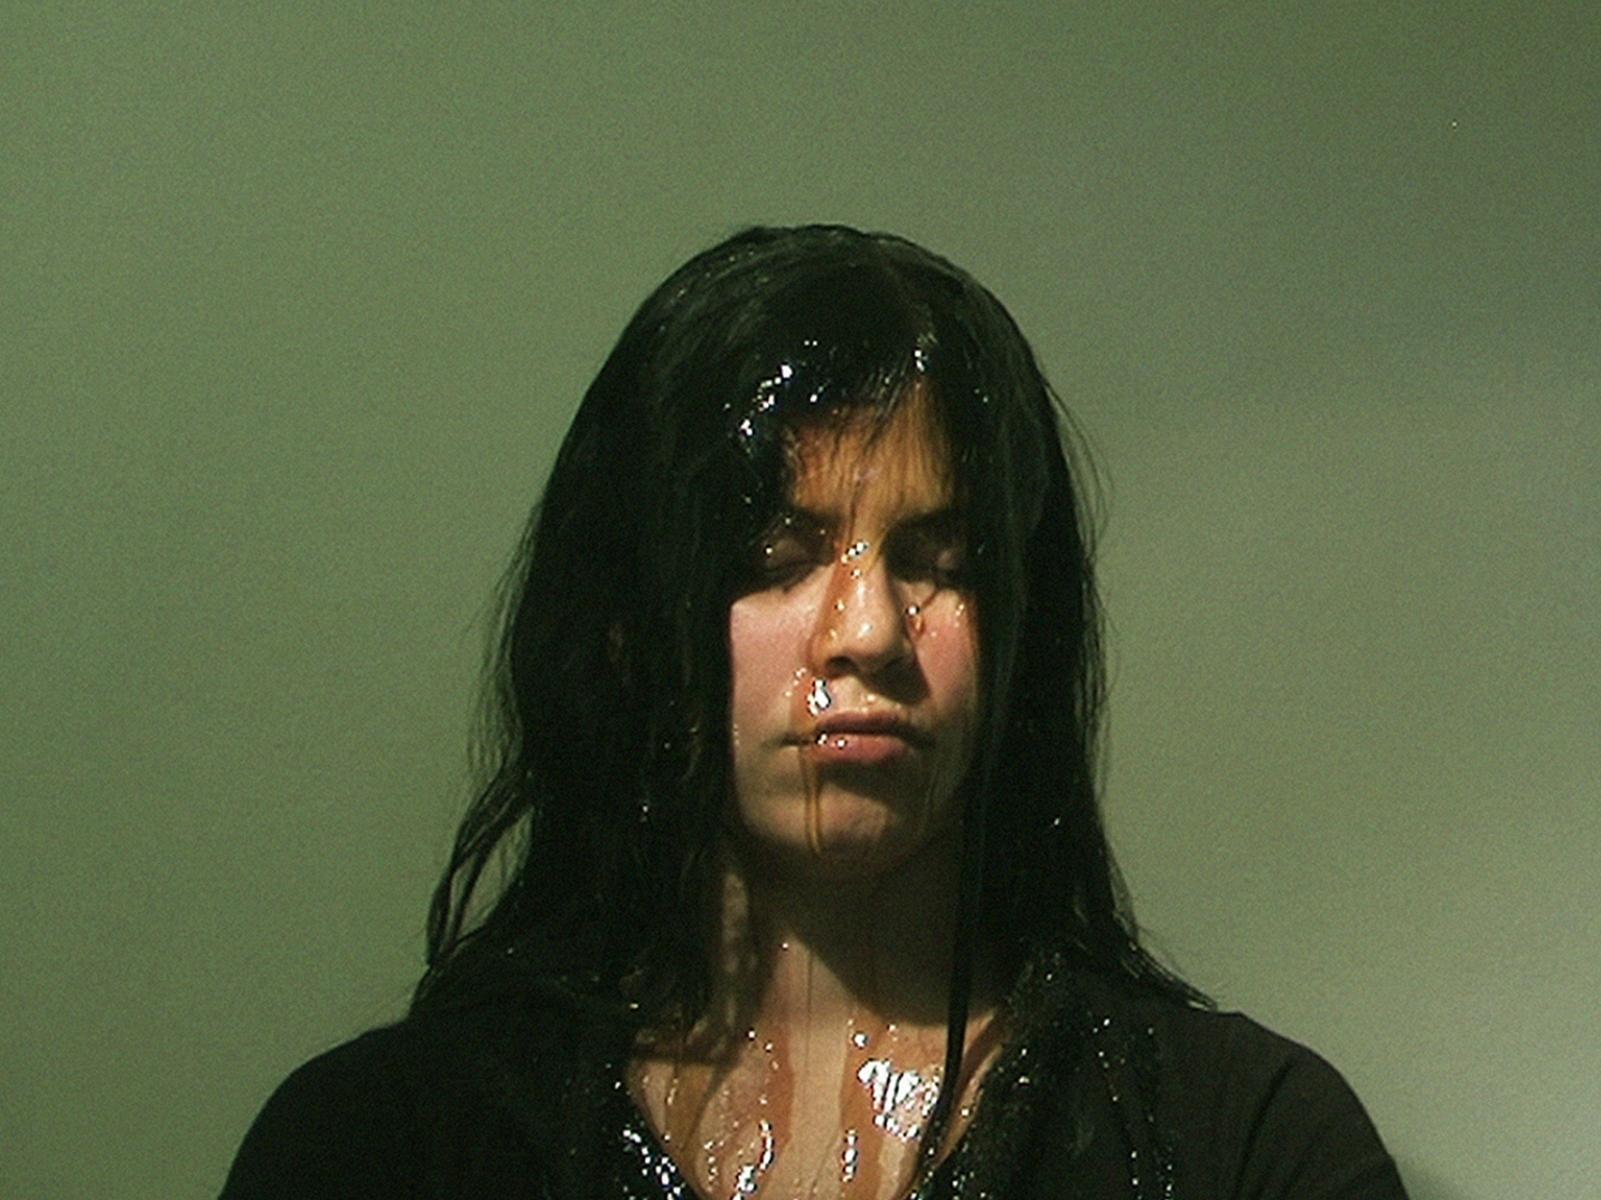 8. A drop of honey, 2013 - Performance, Video Still (Naivy Perez)